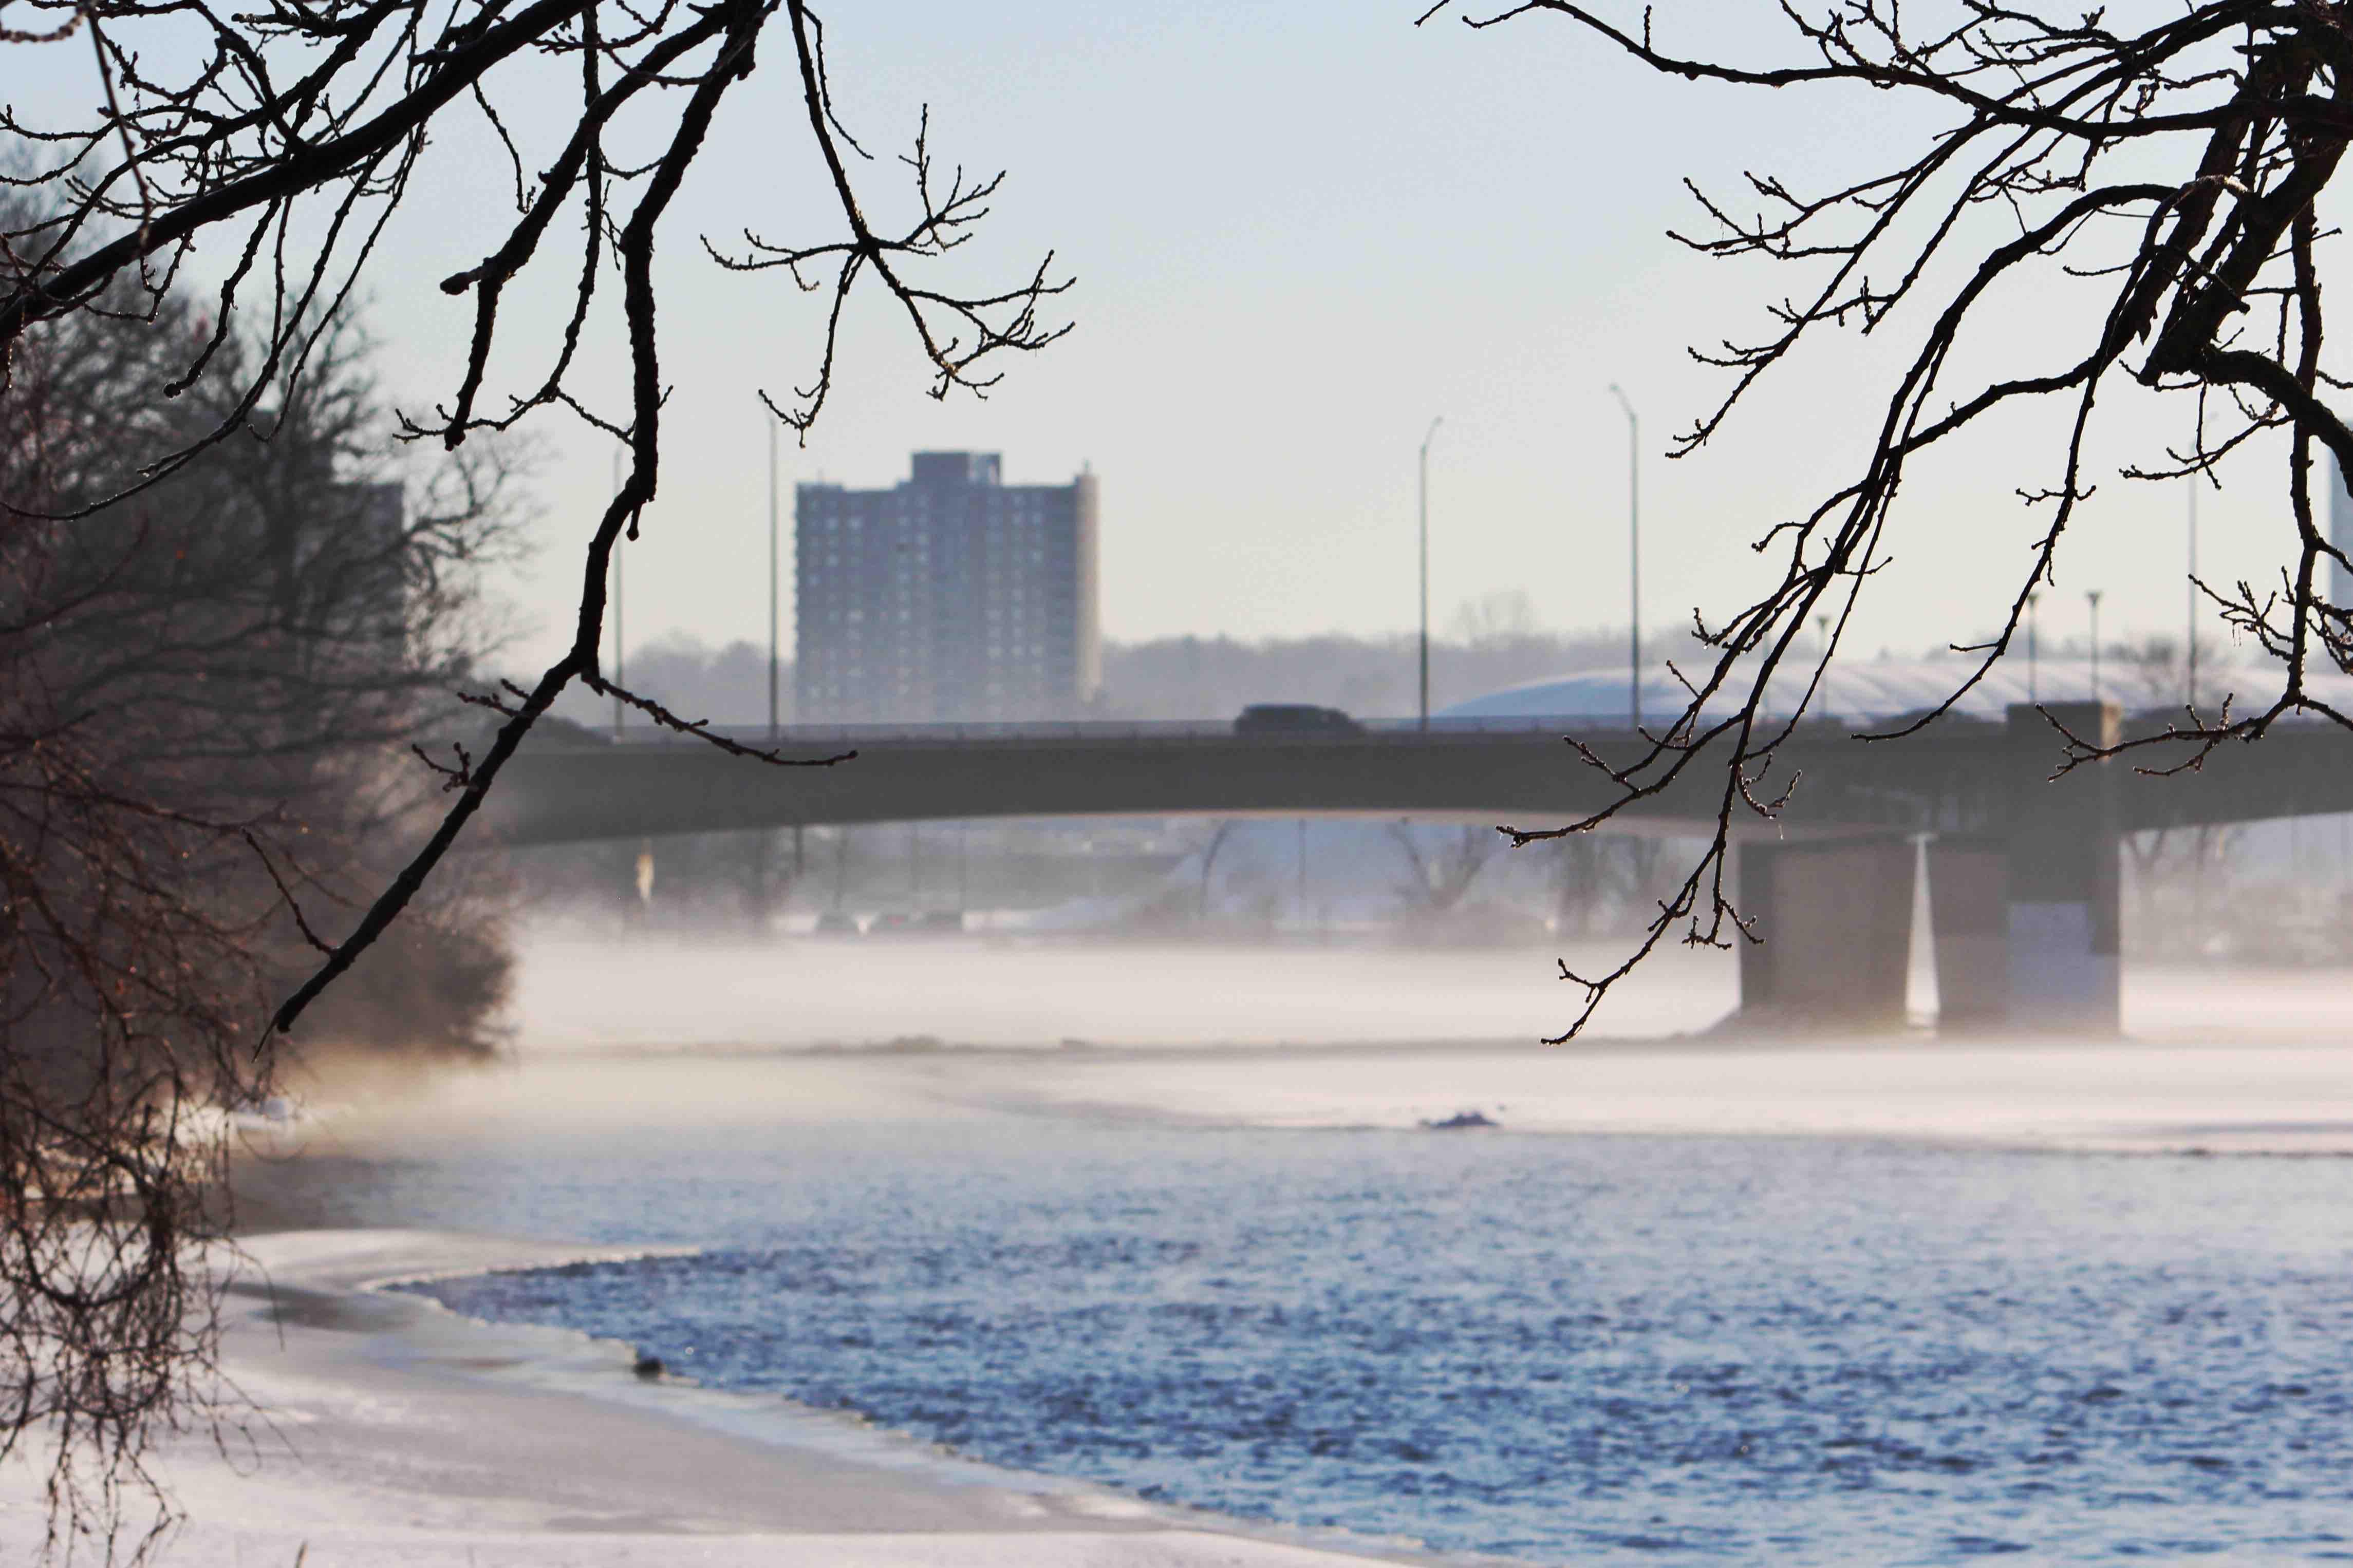 Troubled waters: Road salt increasing in Ottawa waterways, new study shows